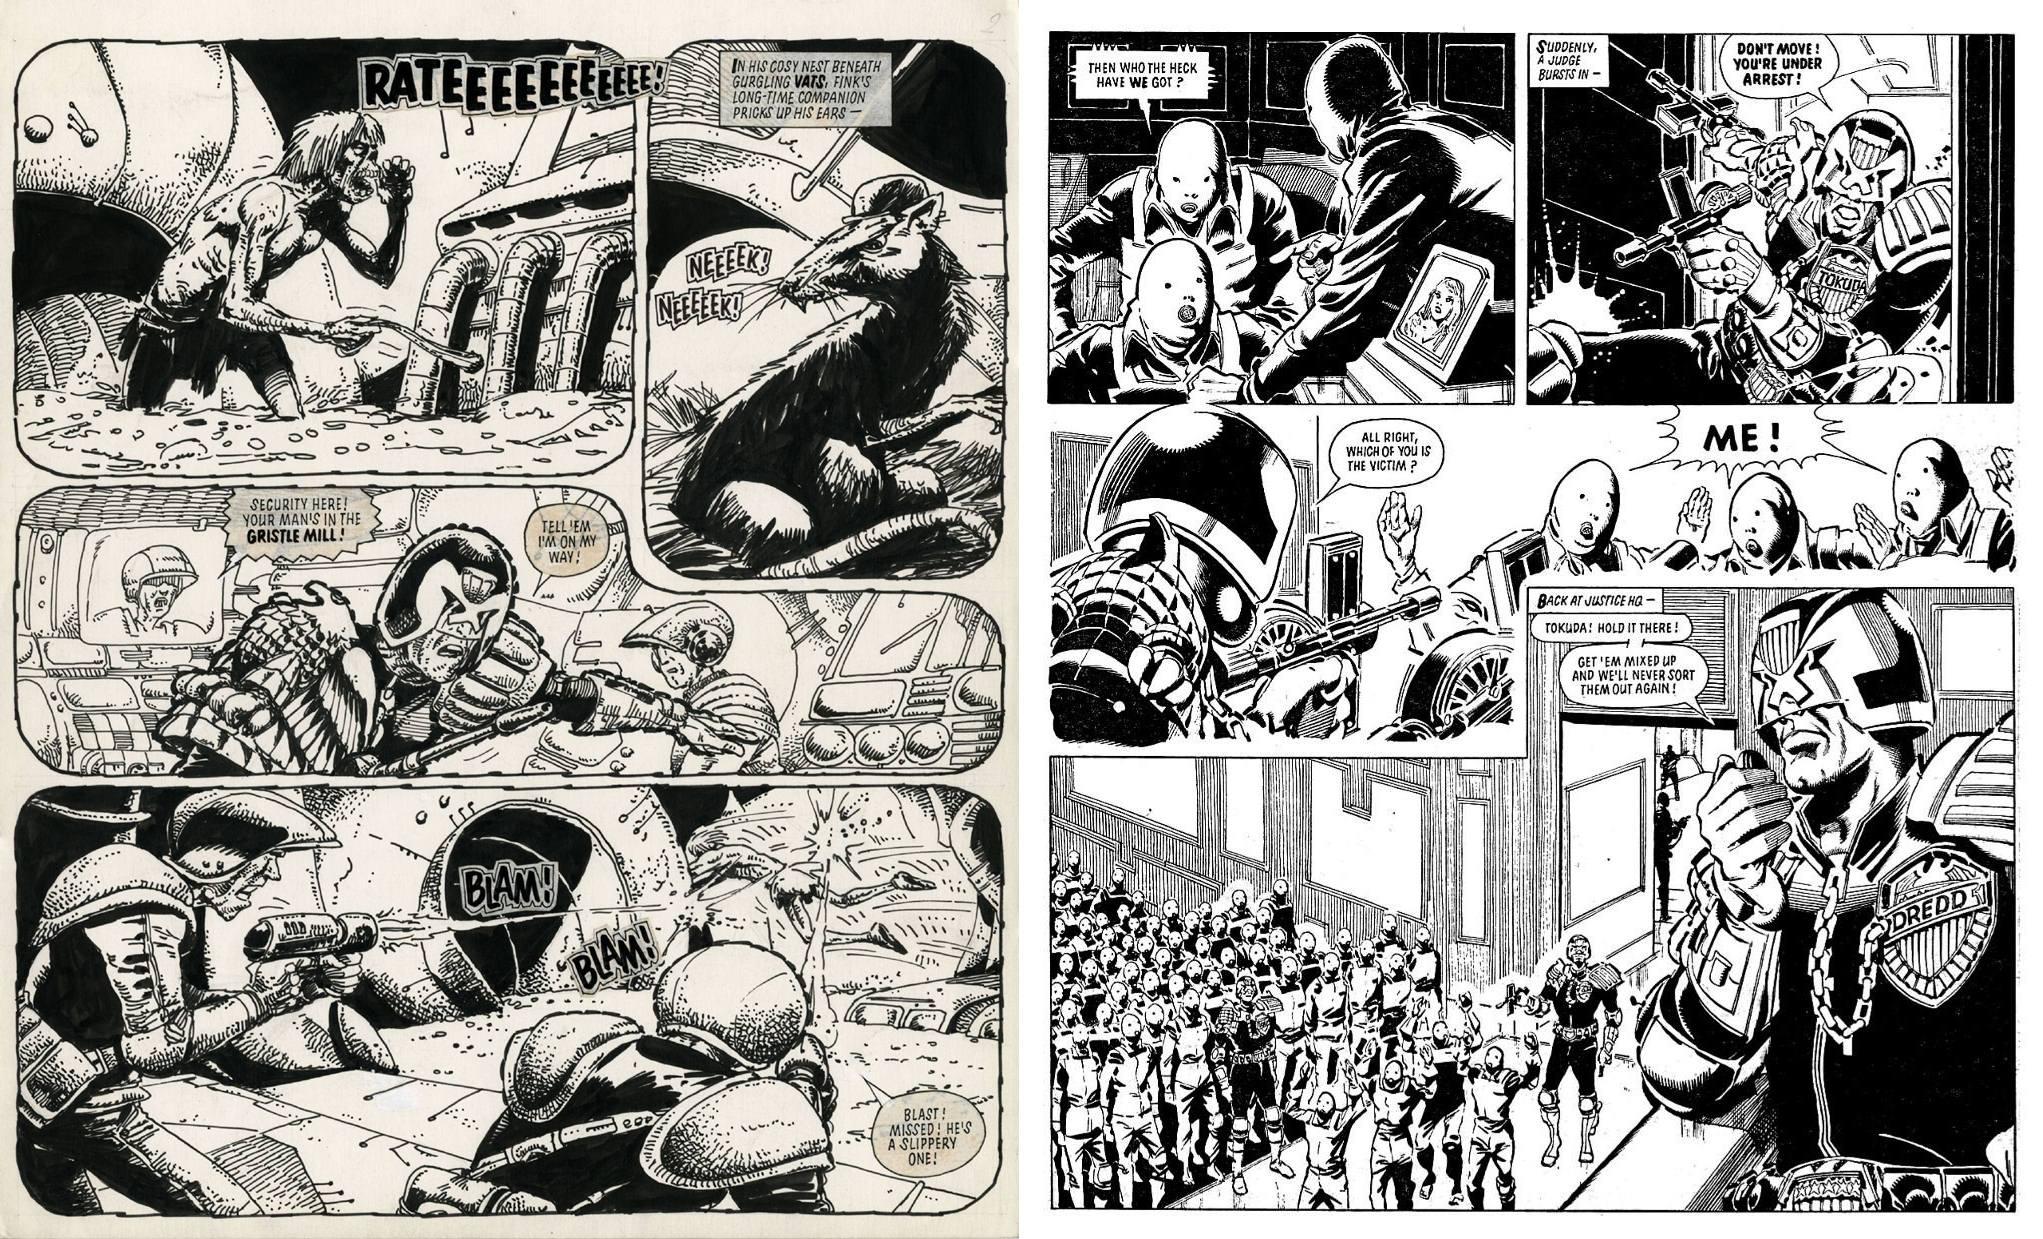 Judge Dredd Complete Case Files 06 review